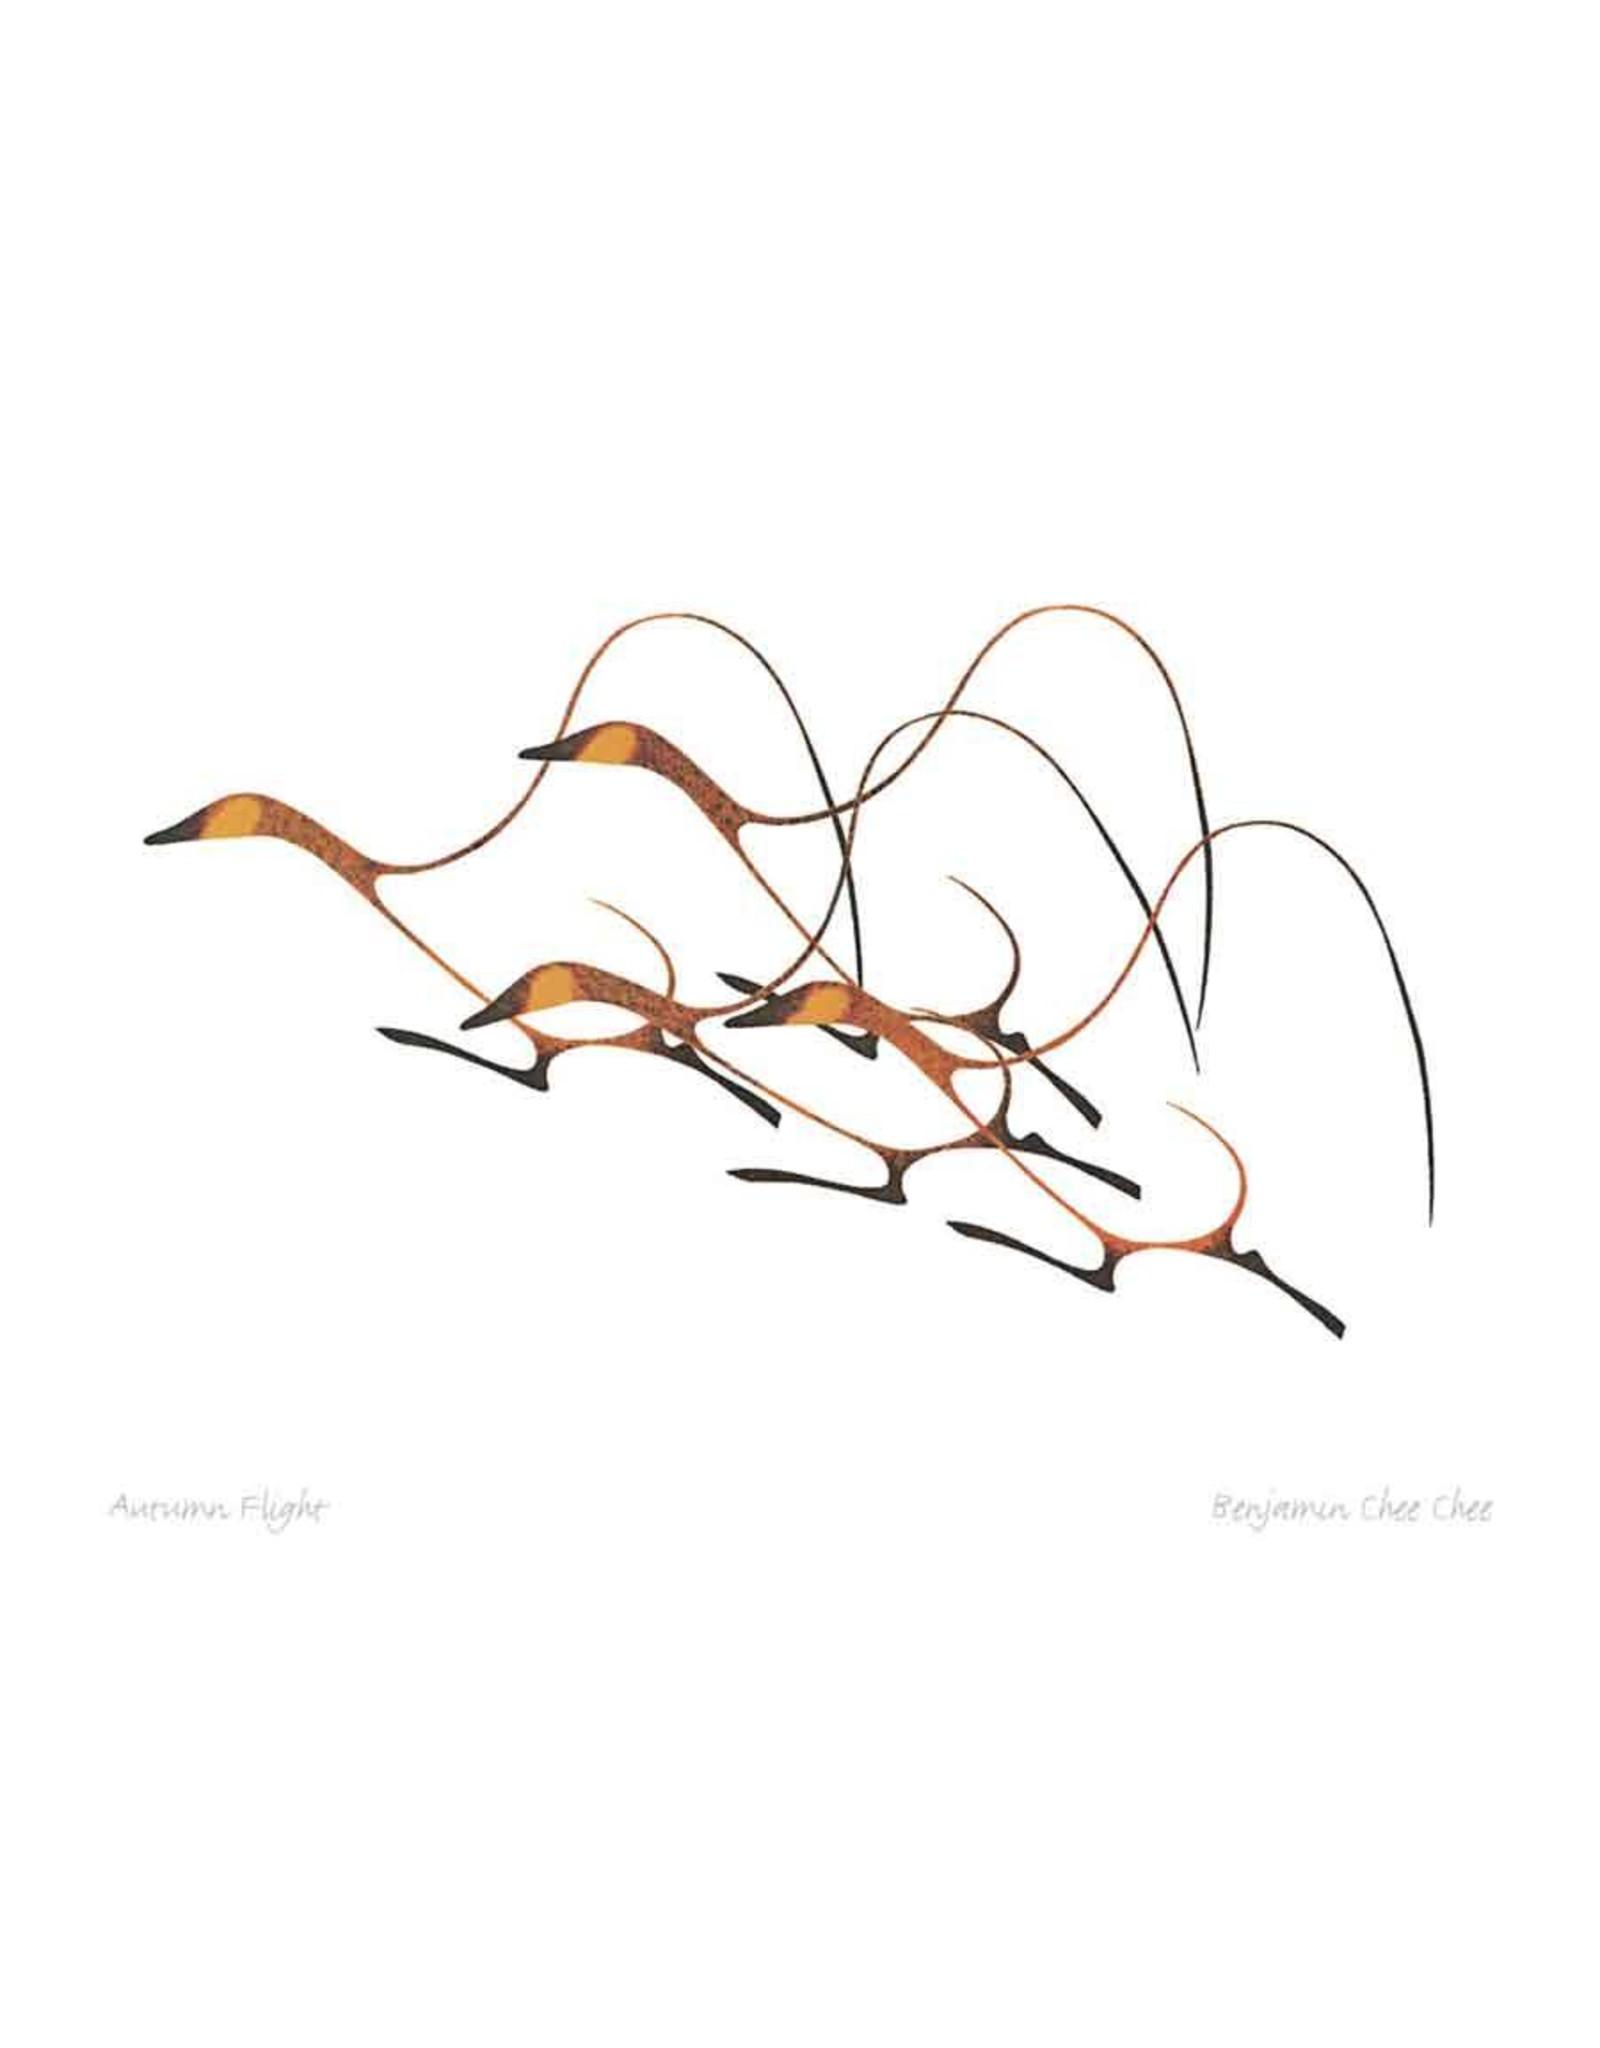 Autumn Flight by Benjamin Chee Chee Framed